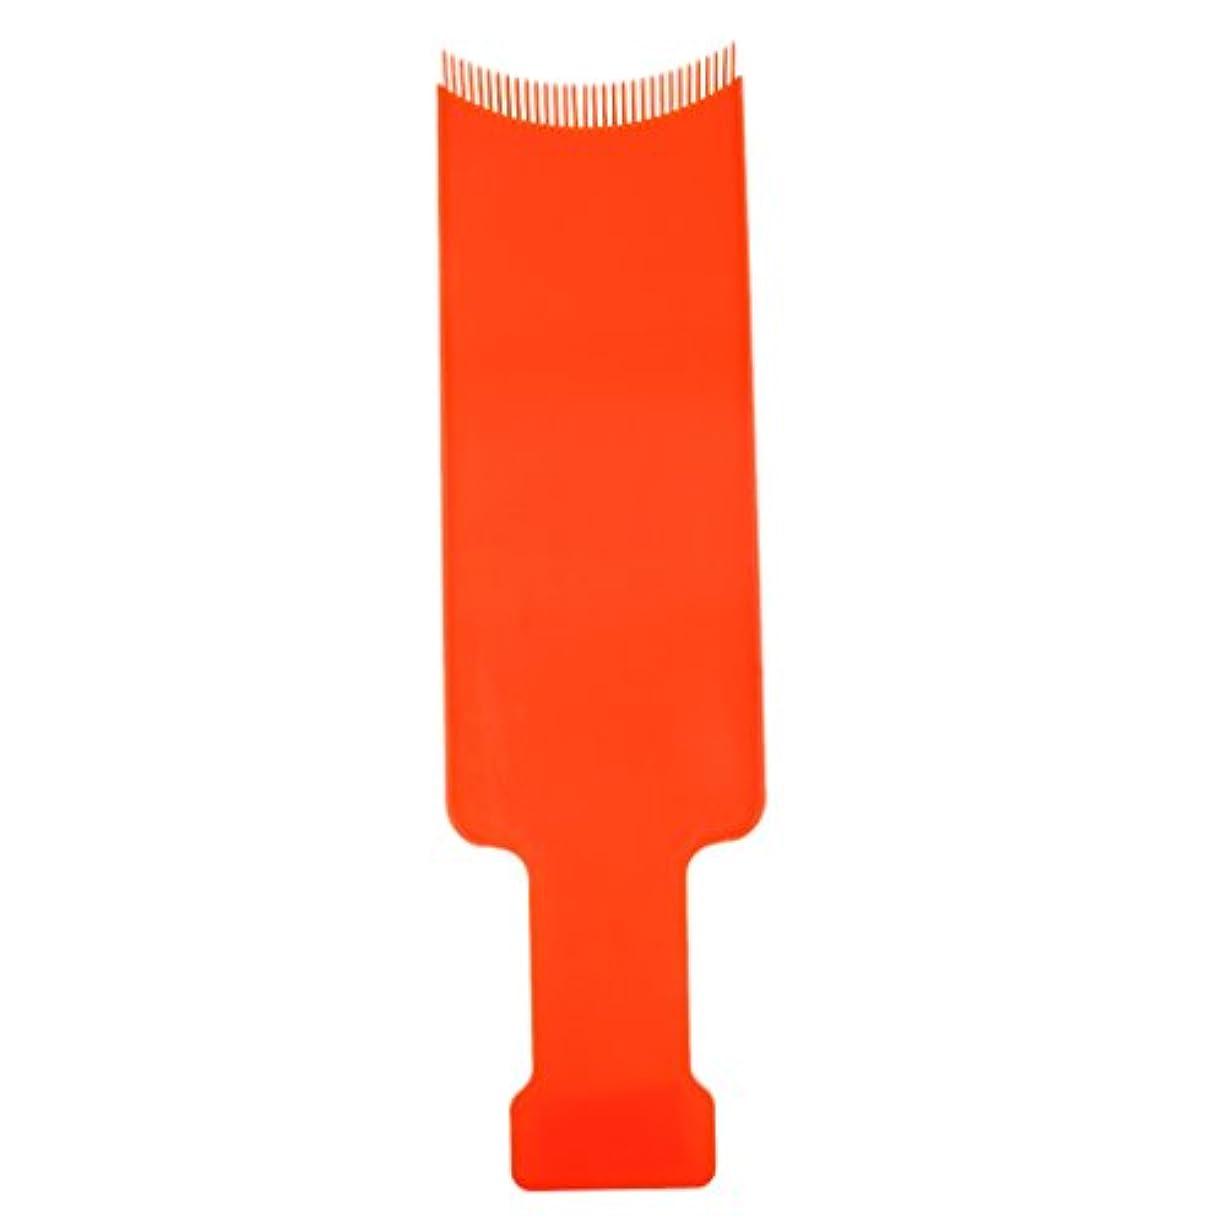 Kesoto 染色櫛プレート 染めボード 髪を染め 頭皮保護 着色ボード ヘアブラシ ヘアコーム ヘアカラー 櫛 2サイズ2色選べる - L, オレンジ